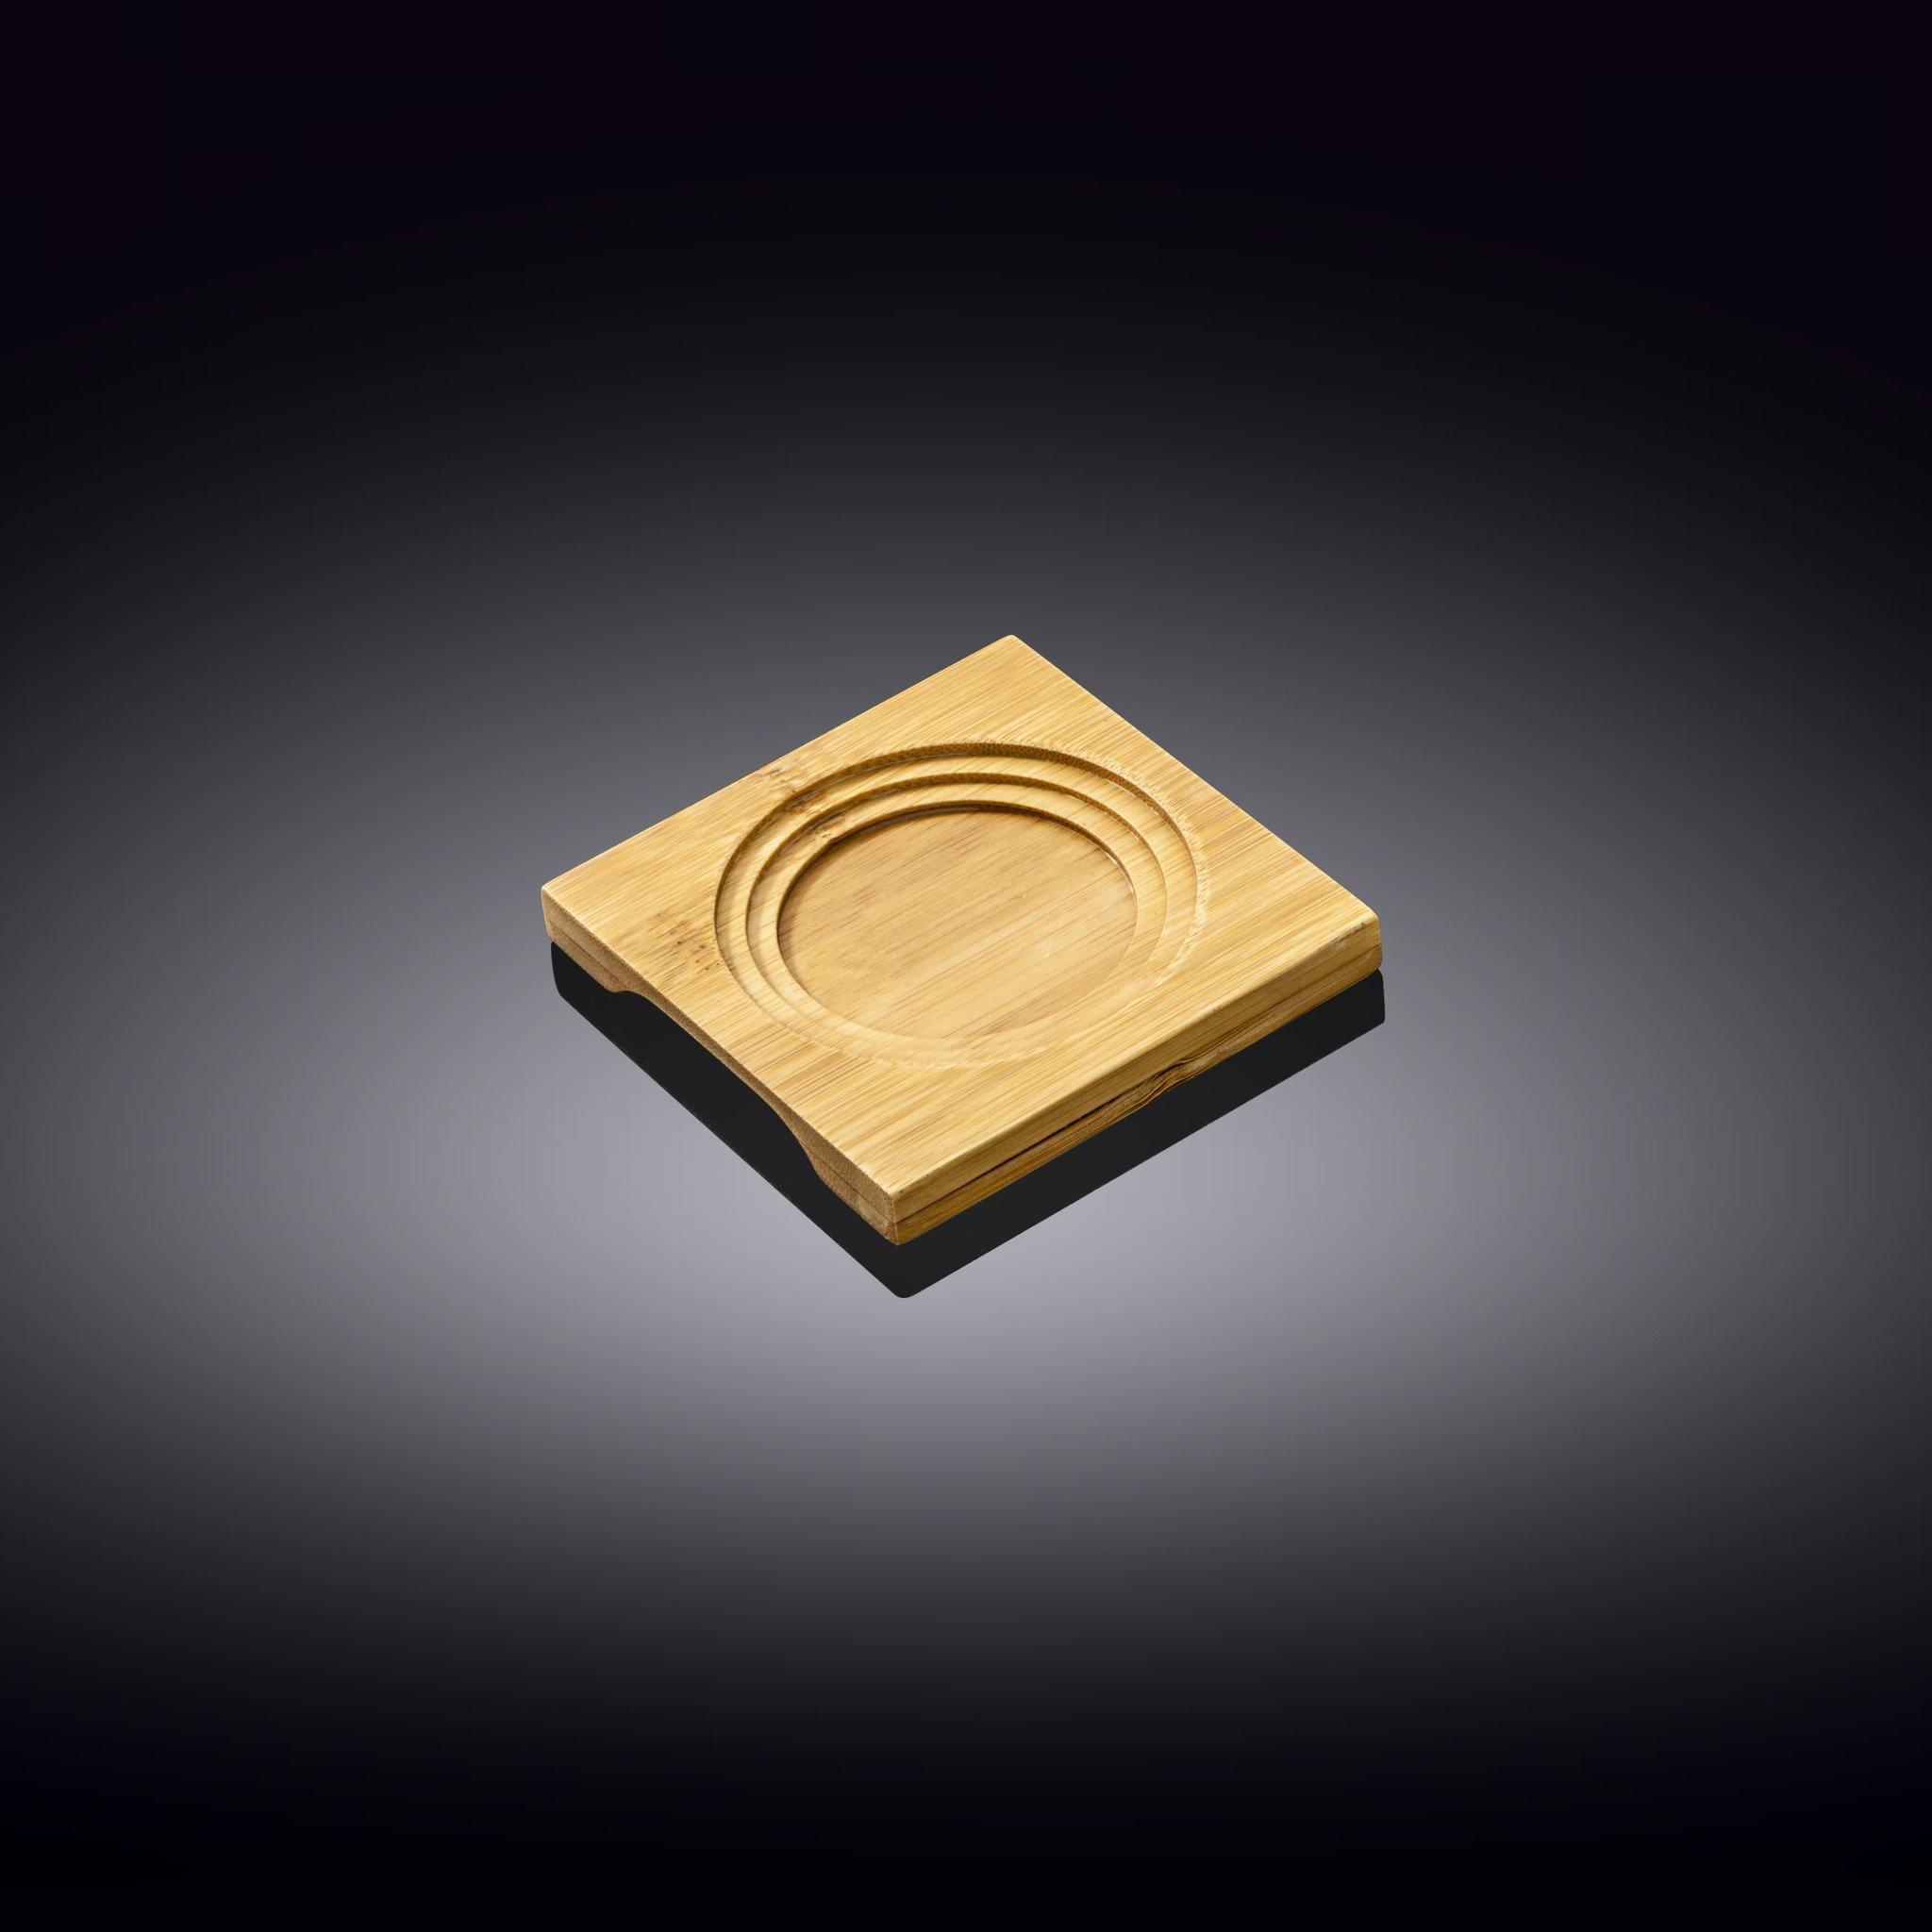 Поднос бамбуковый Wilmax 1 секция, 10 x 10 см